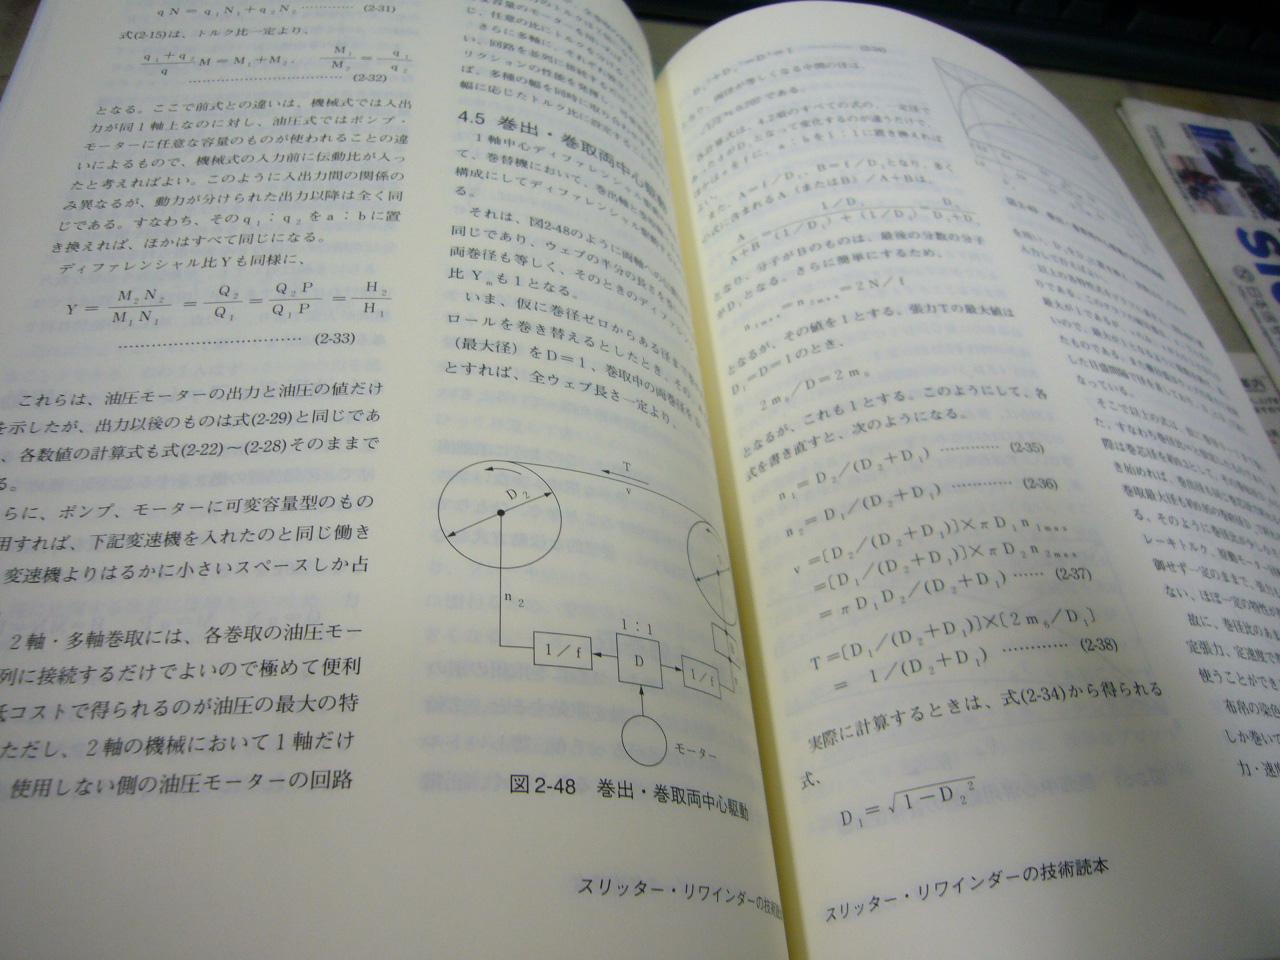 P1020788.jpg